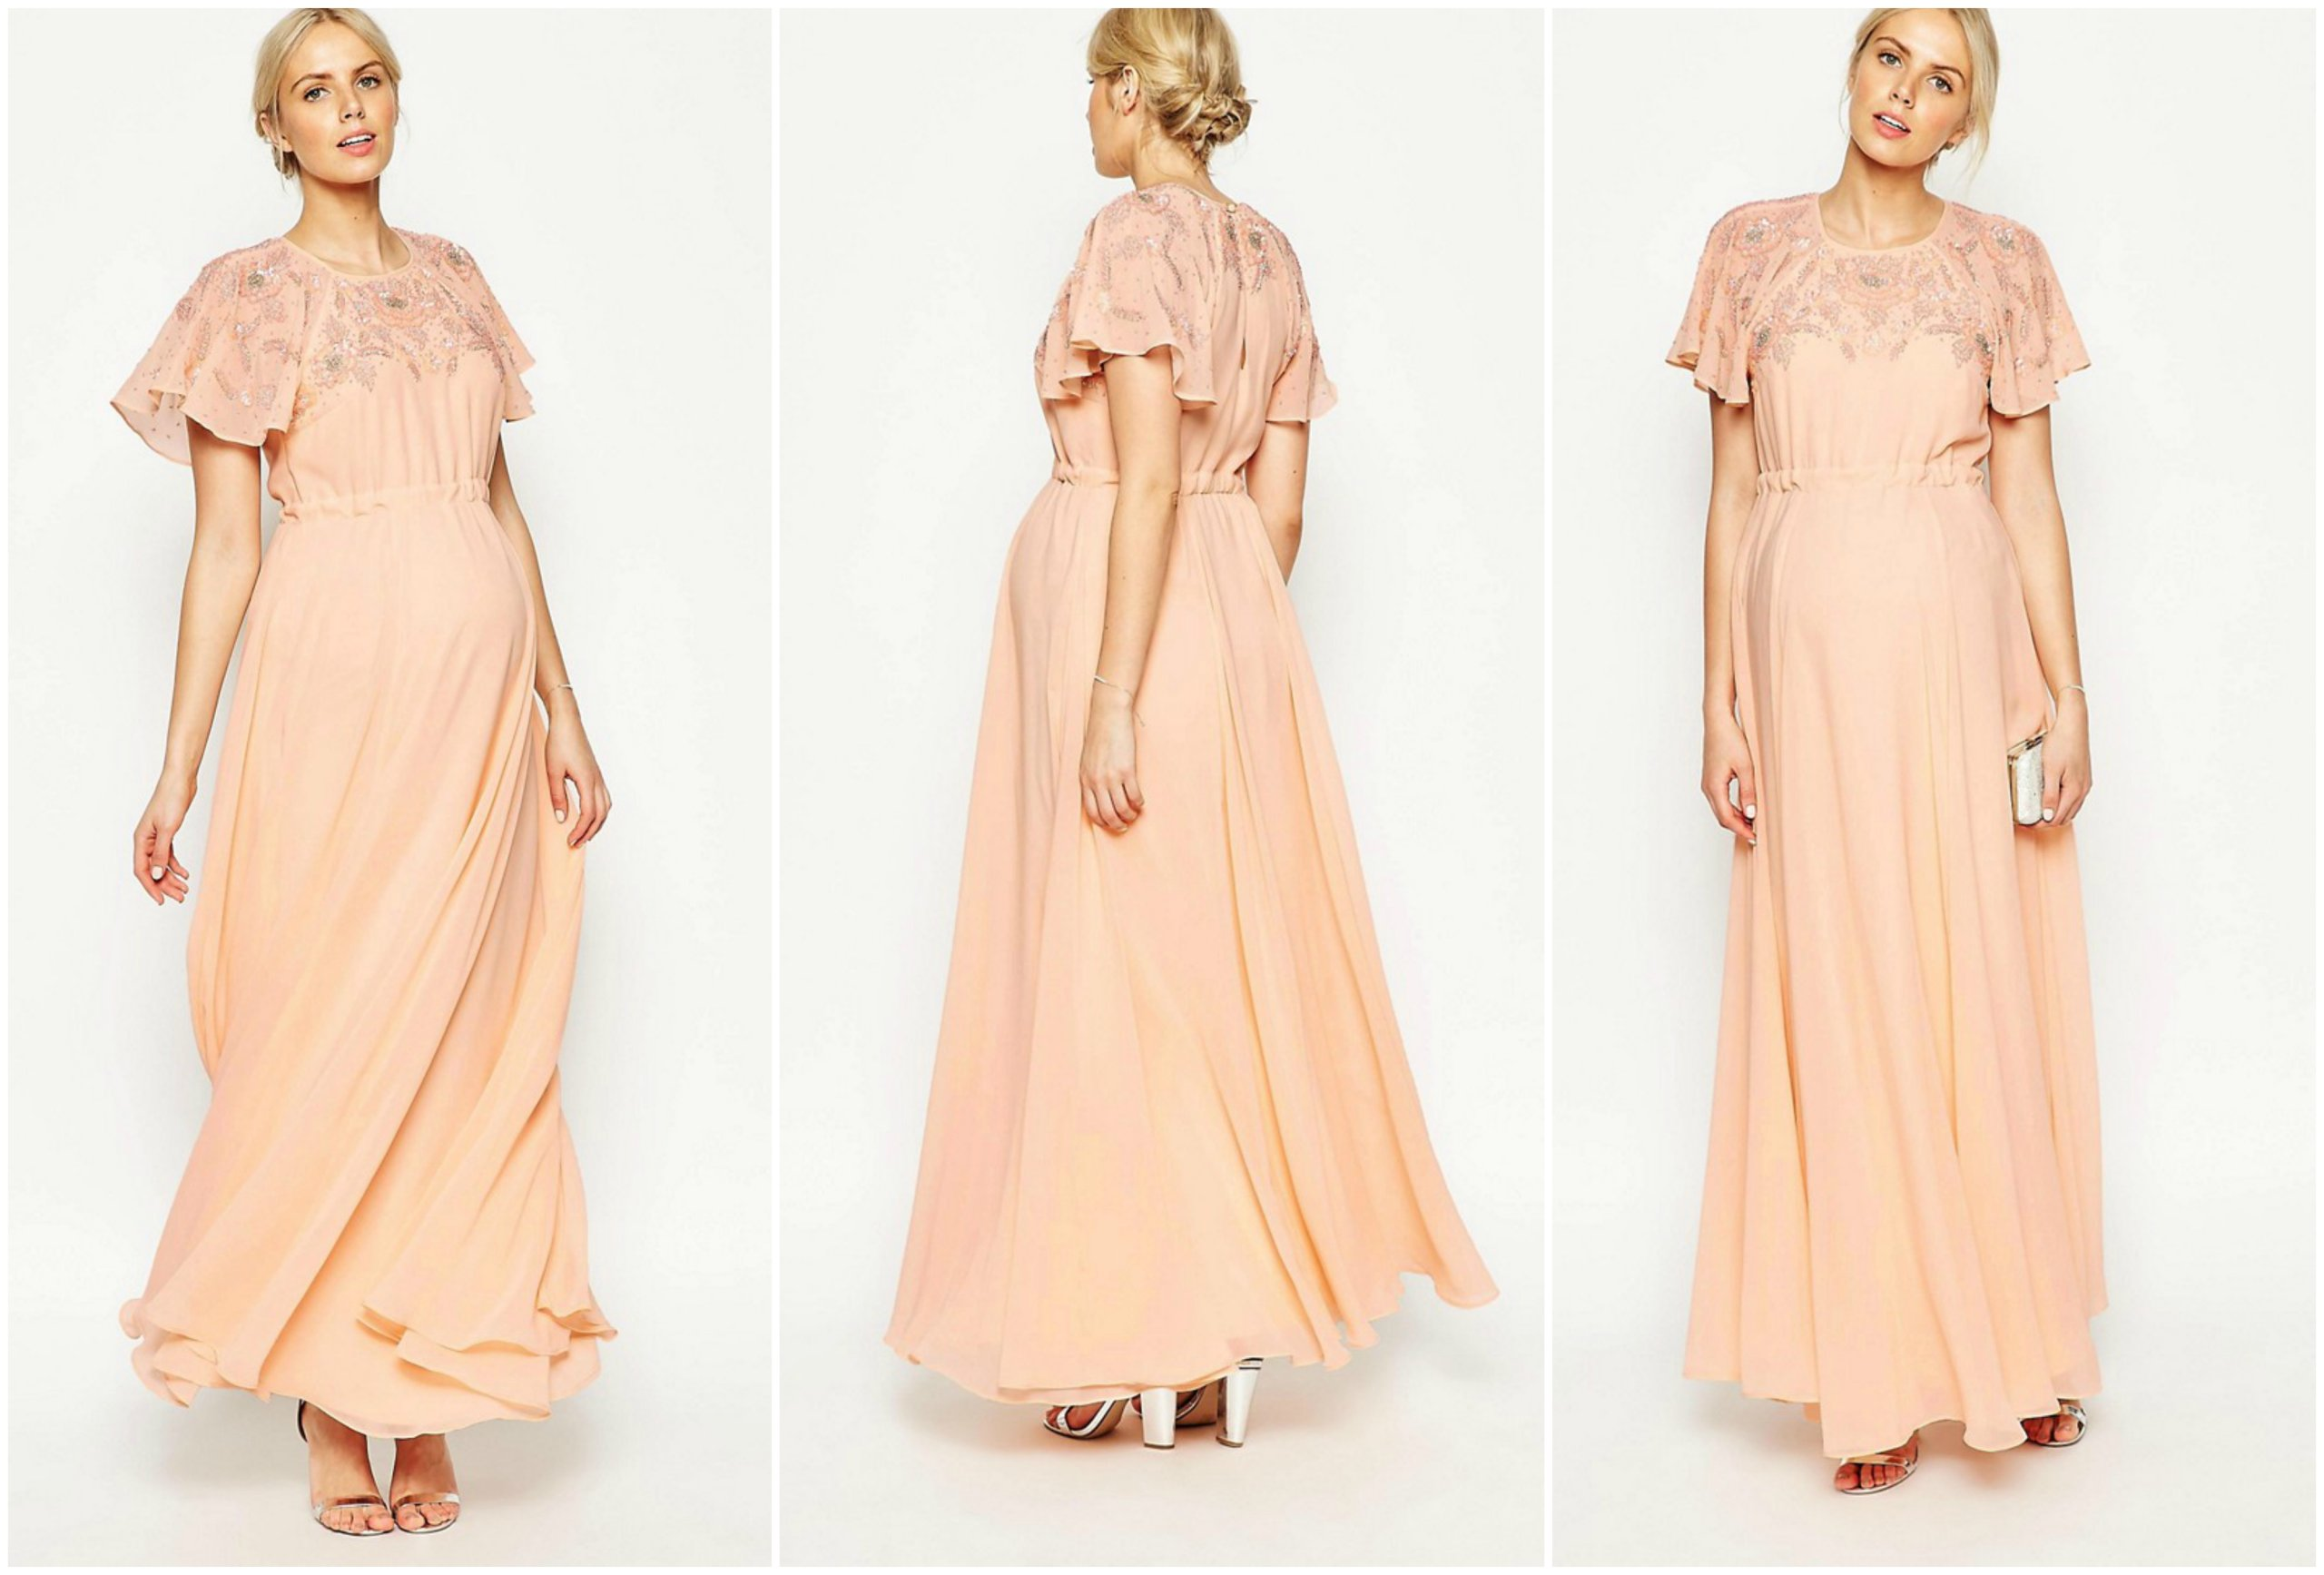 4e639df854 asos sukienka maxi w Oficjalnym Archiwum Allegro - Strona 15 - archiwum  ofert